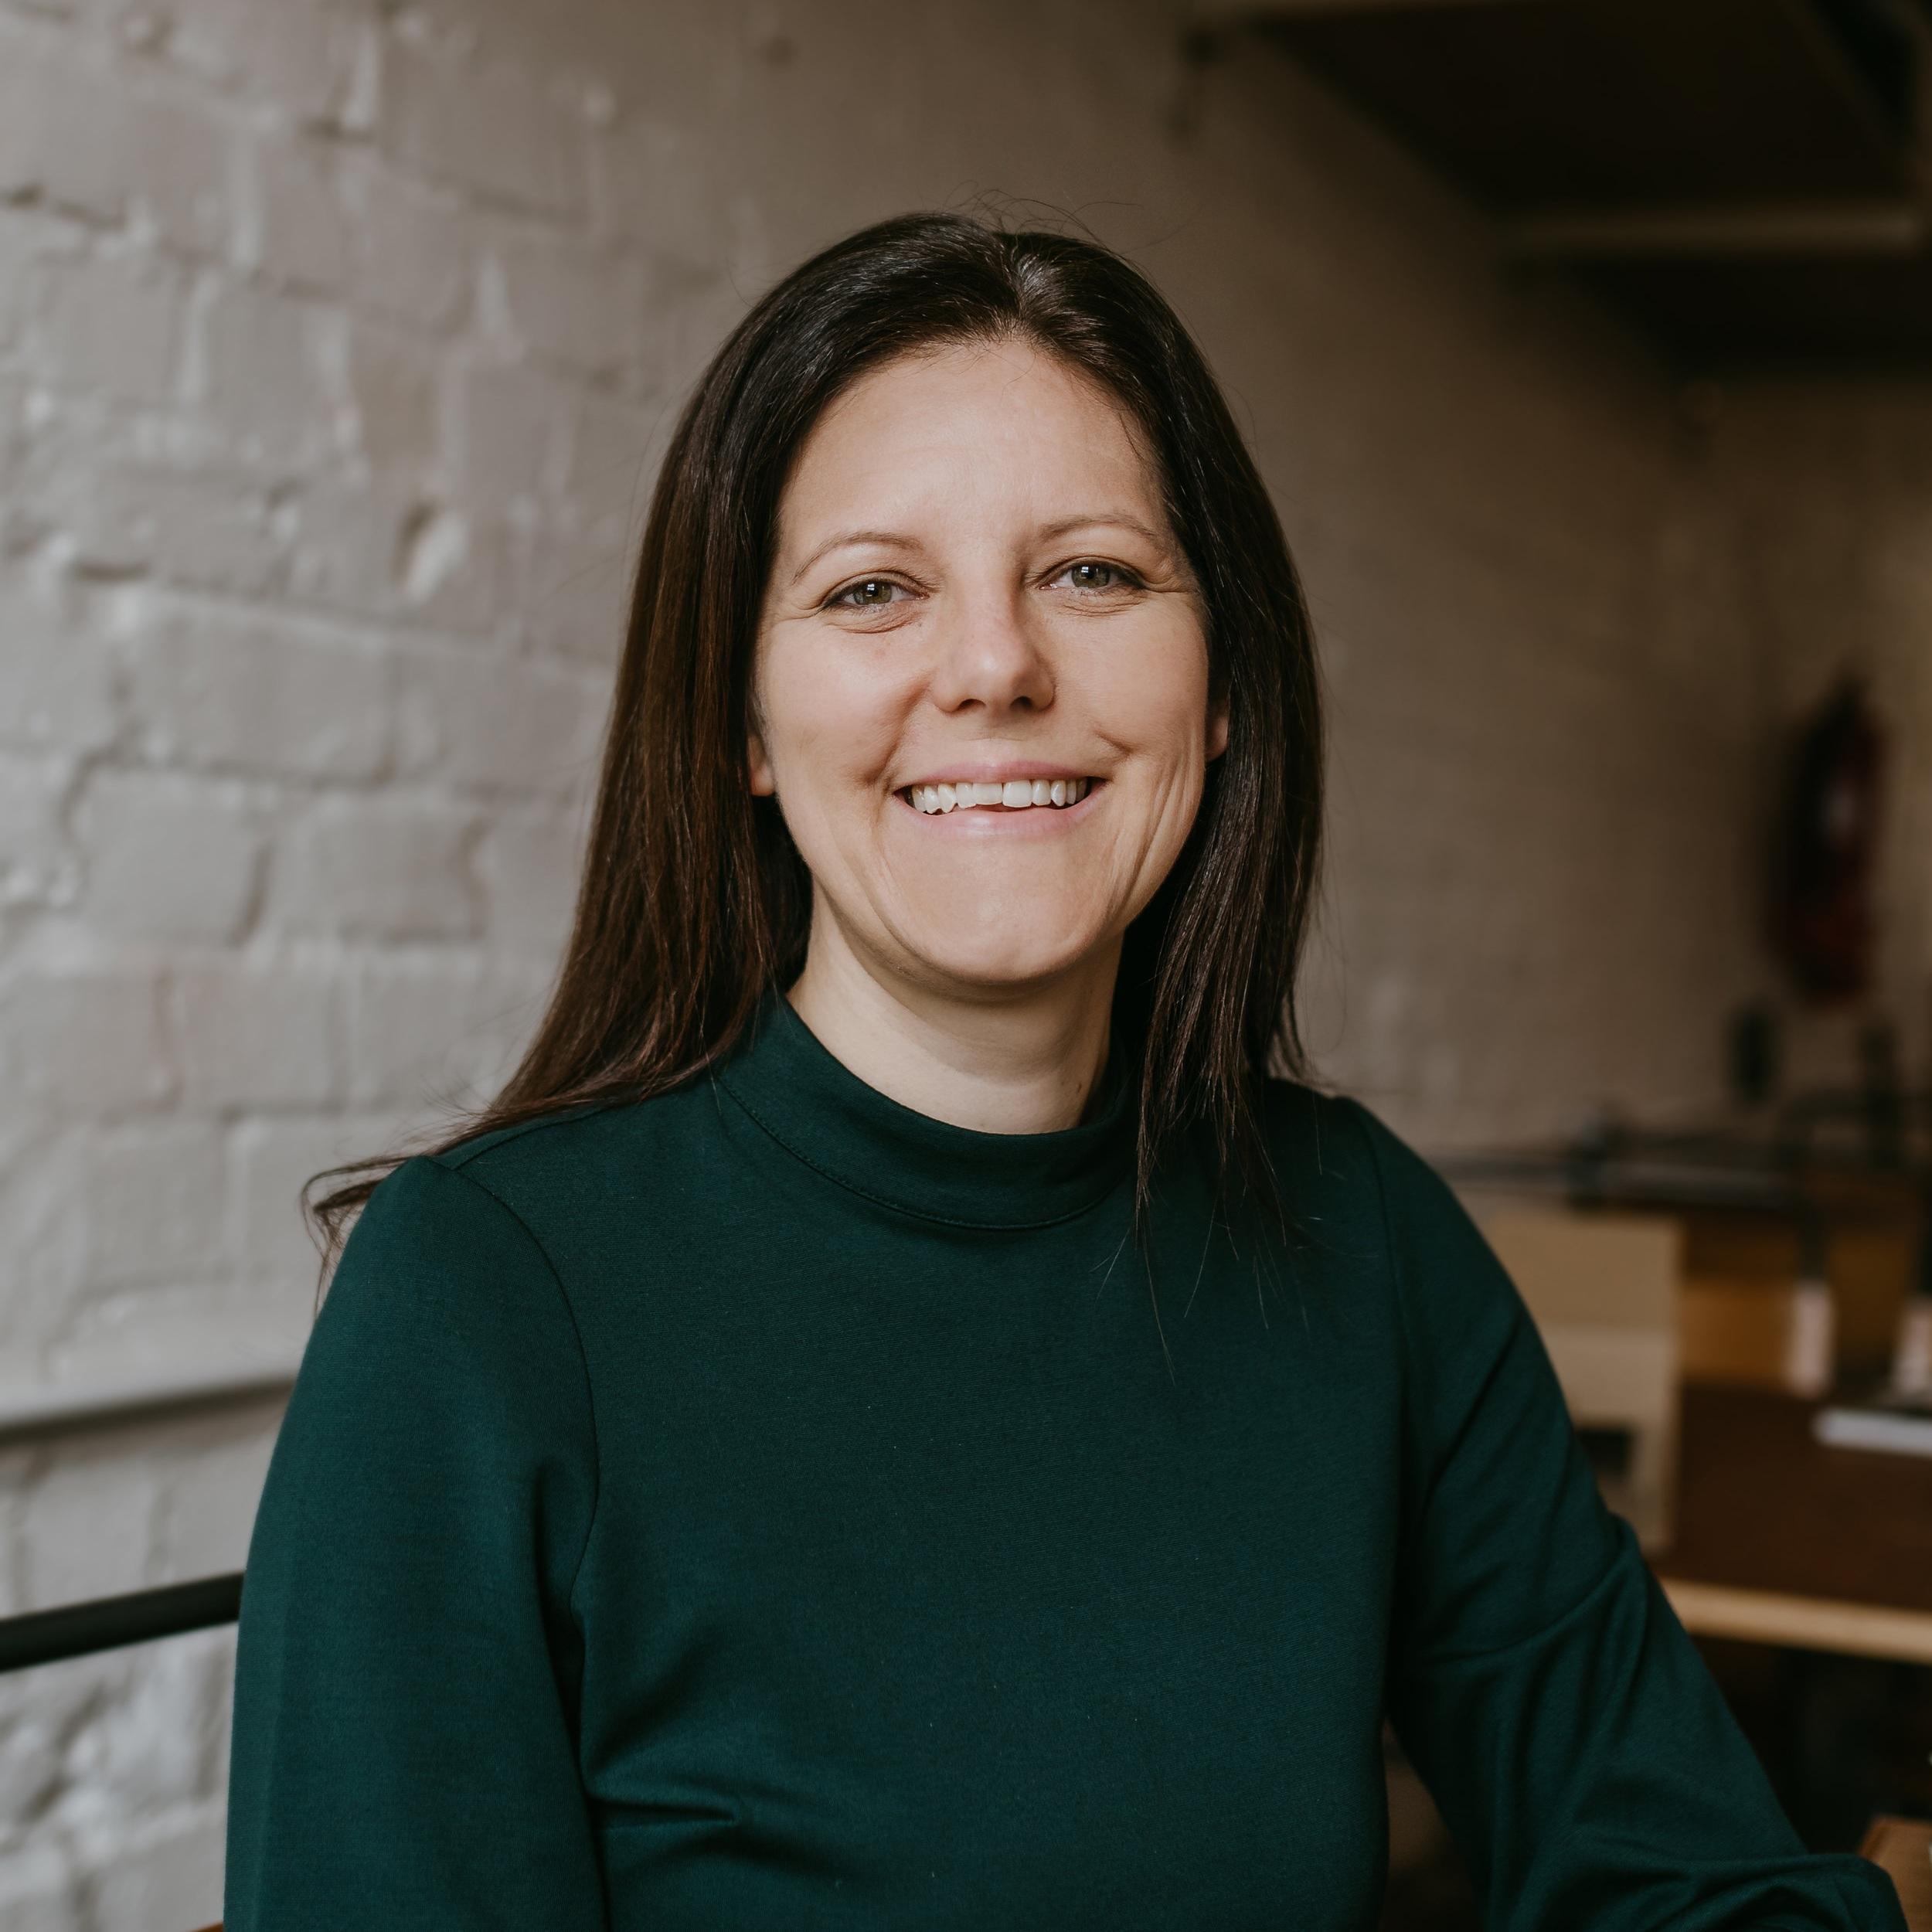 Amanda Spence, architect and partner at ALT-Architecture, Cardiff